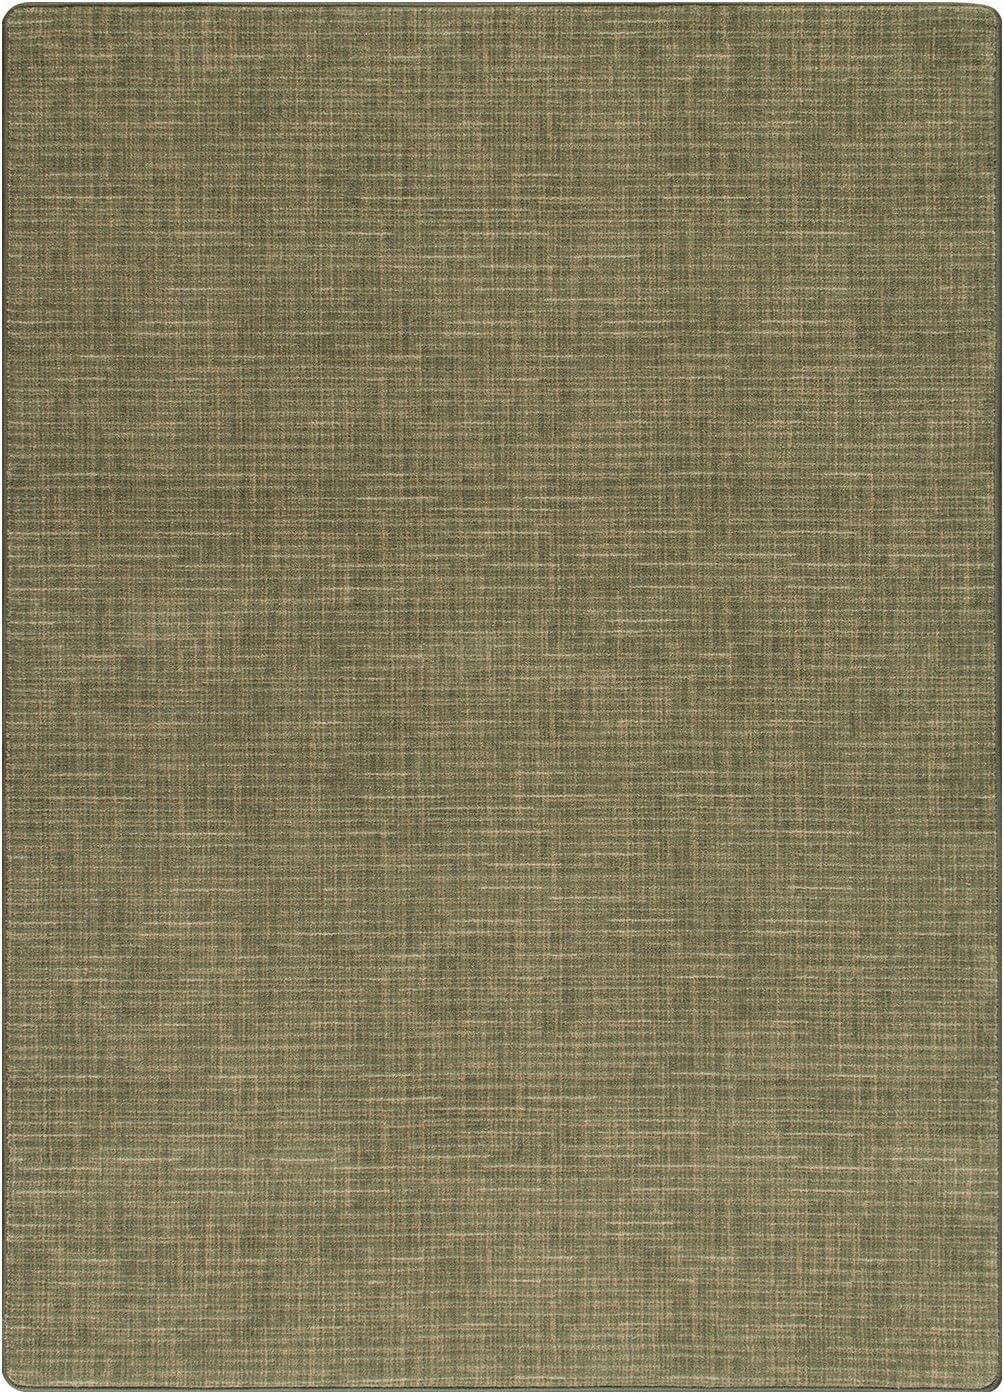 Amazon Com Milliken Imagine Figurative Collection Broadcloth Area Rug 5 4 X 7 8 Grass Cloth Furniture Decor